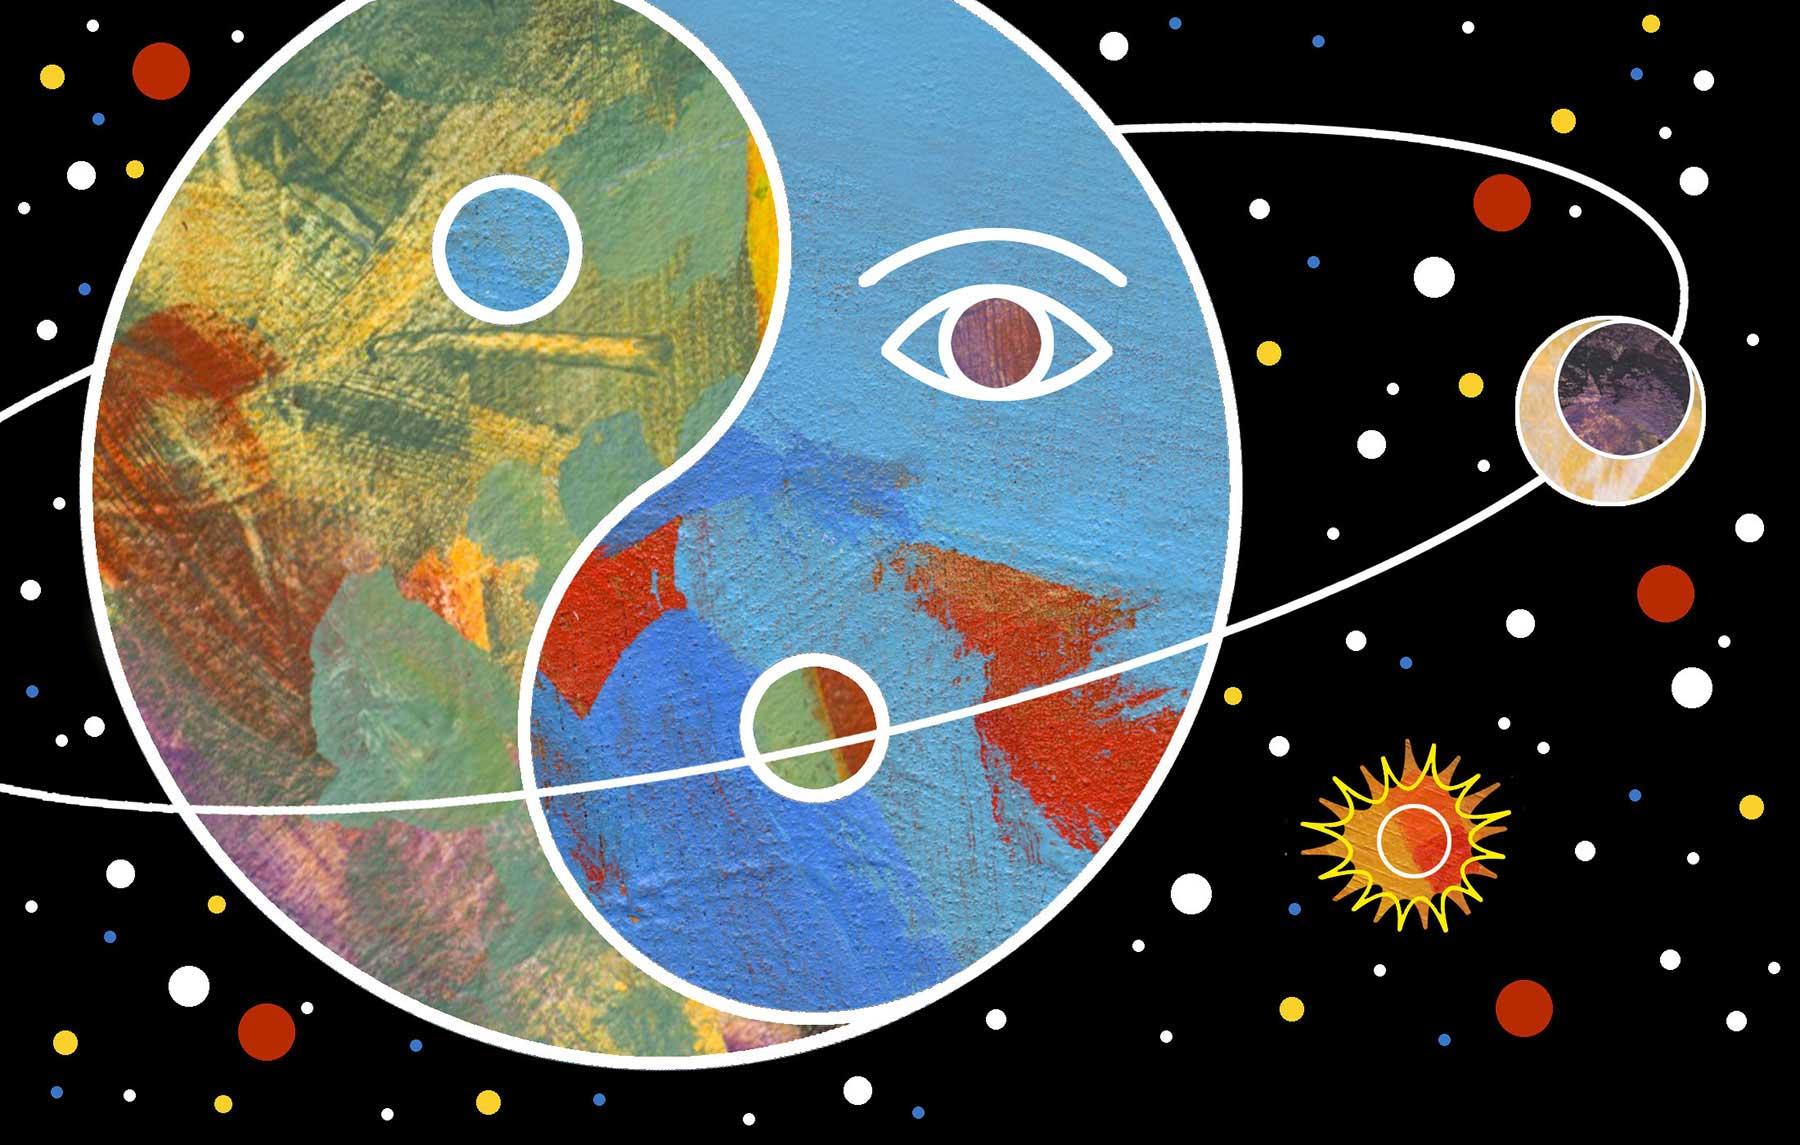 Jim Dryden / Planetary